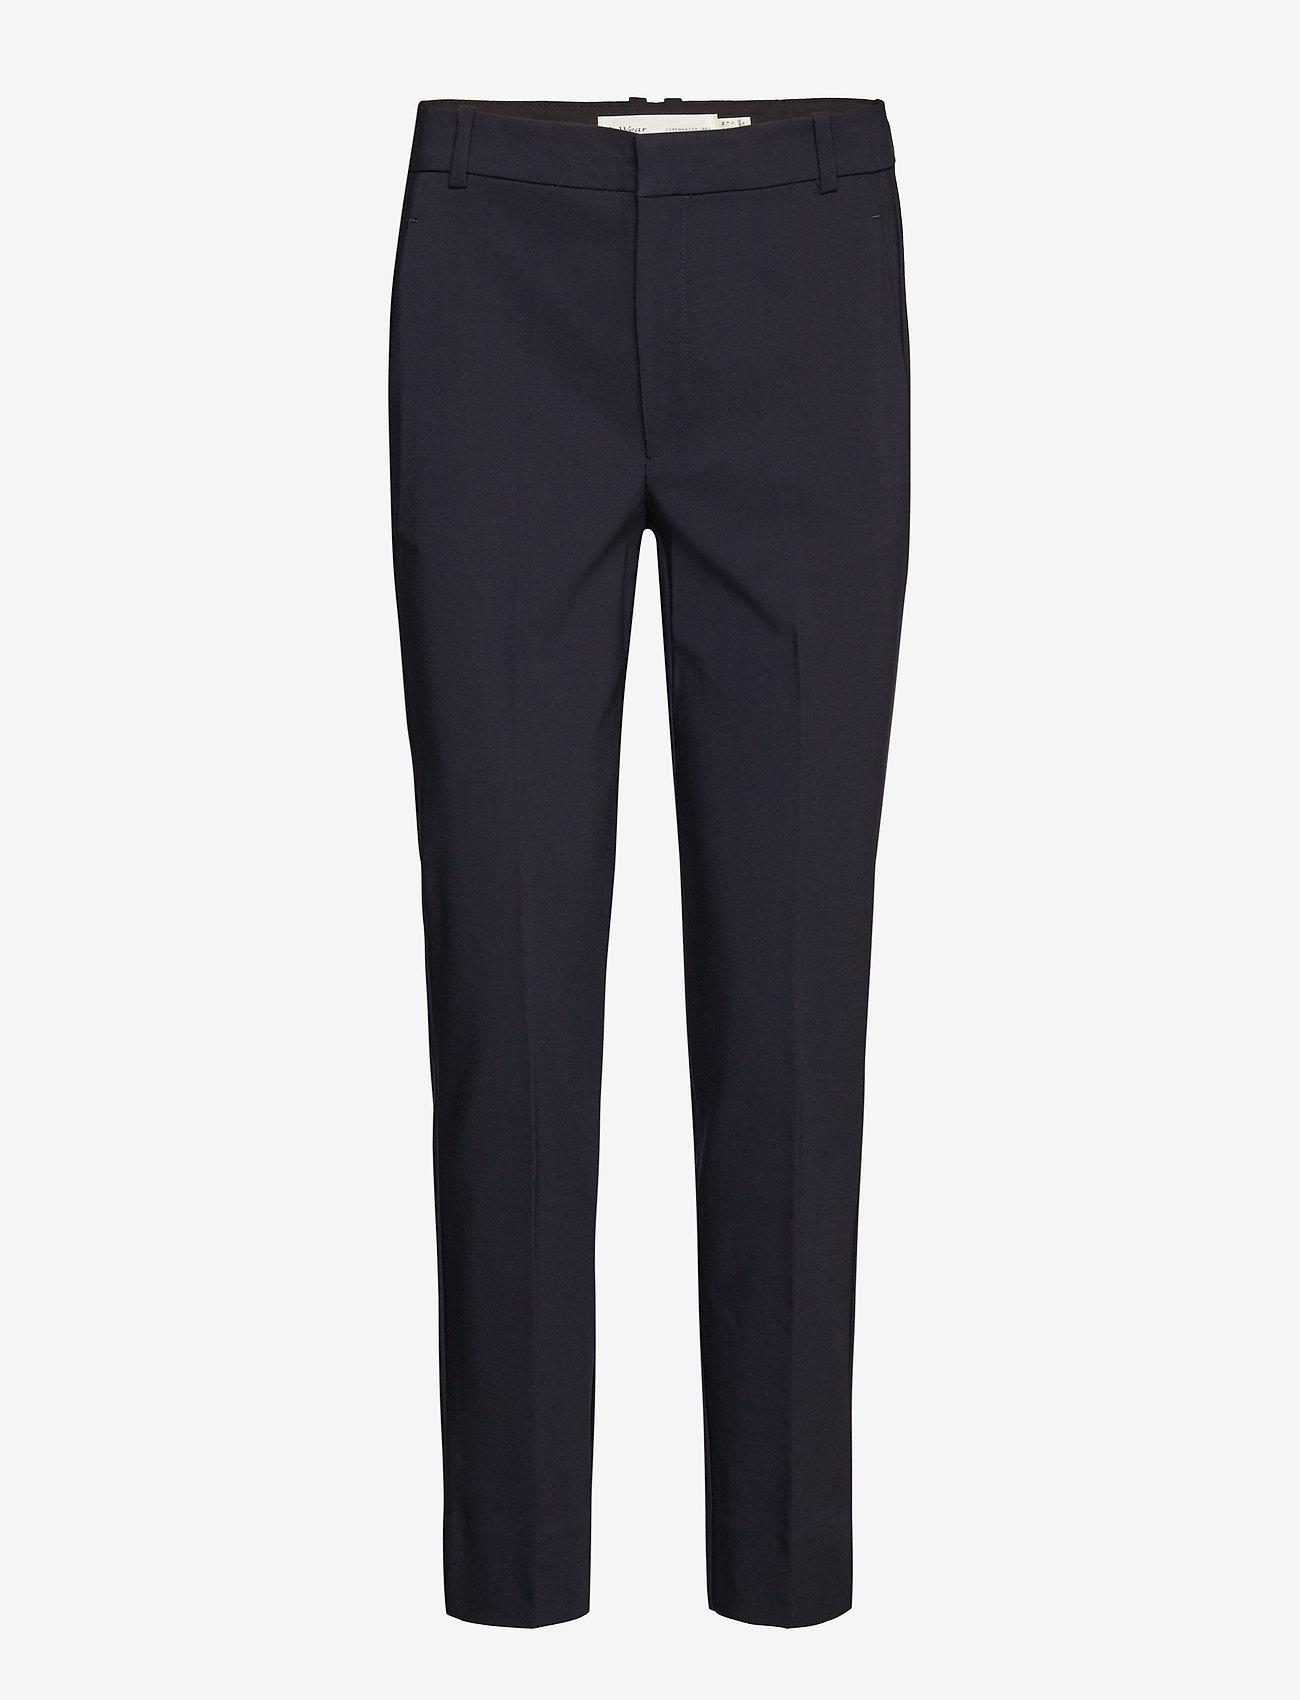 InWear - Zella Pant - slim fit bukser - marine blue - 1